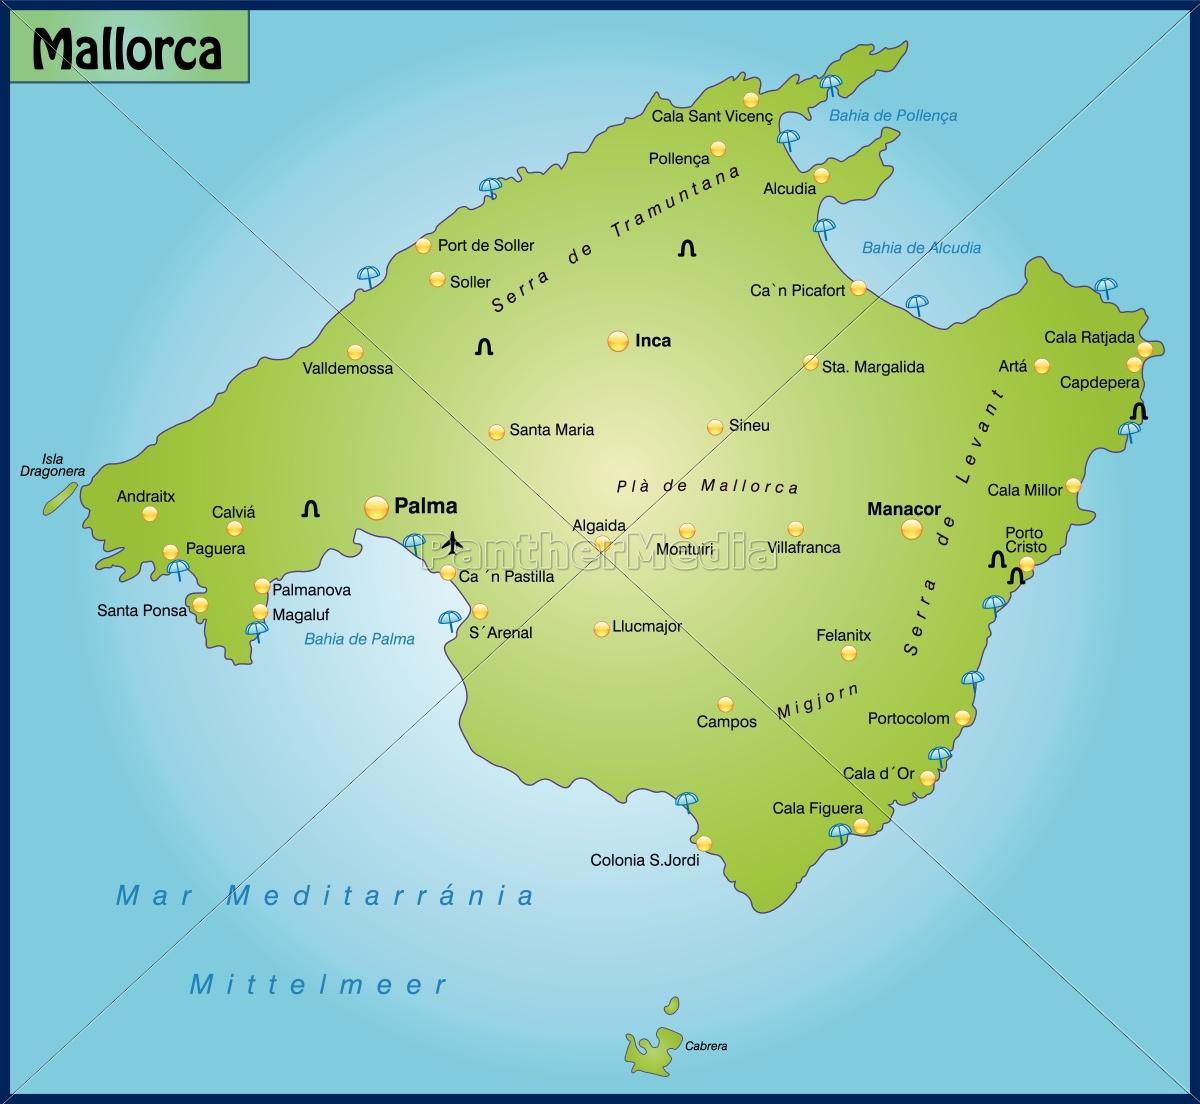 Mallorca Karte Alcudia.Lizenzfreie Vektorgrafik 10656045 Karte Von Mallorca Als übersichtskarte In Grün